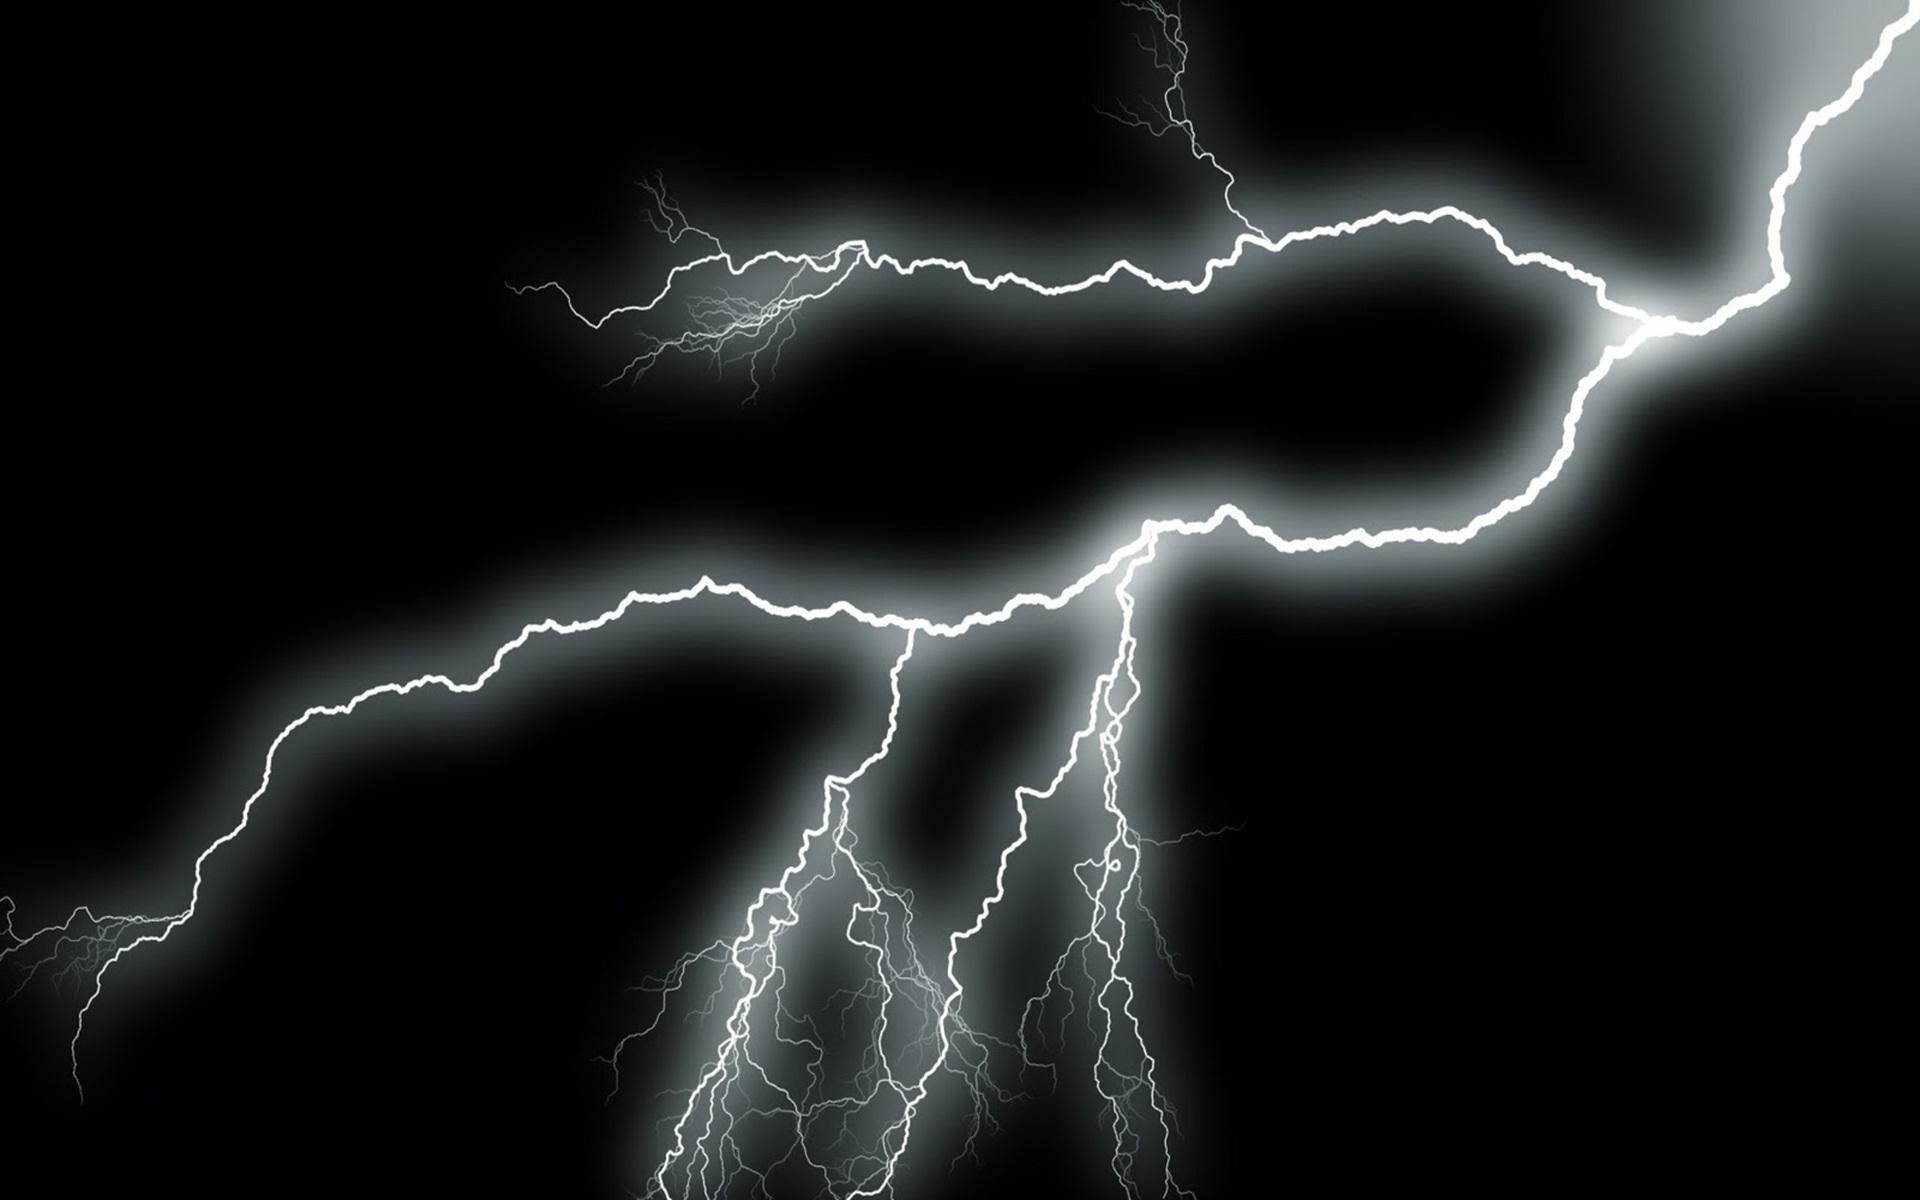 real lightning storm wallpaper photo